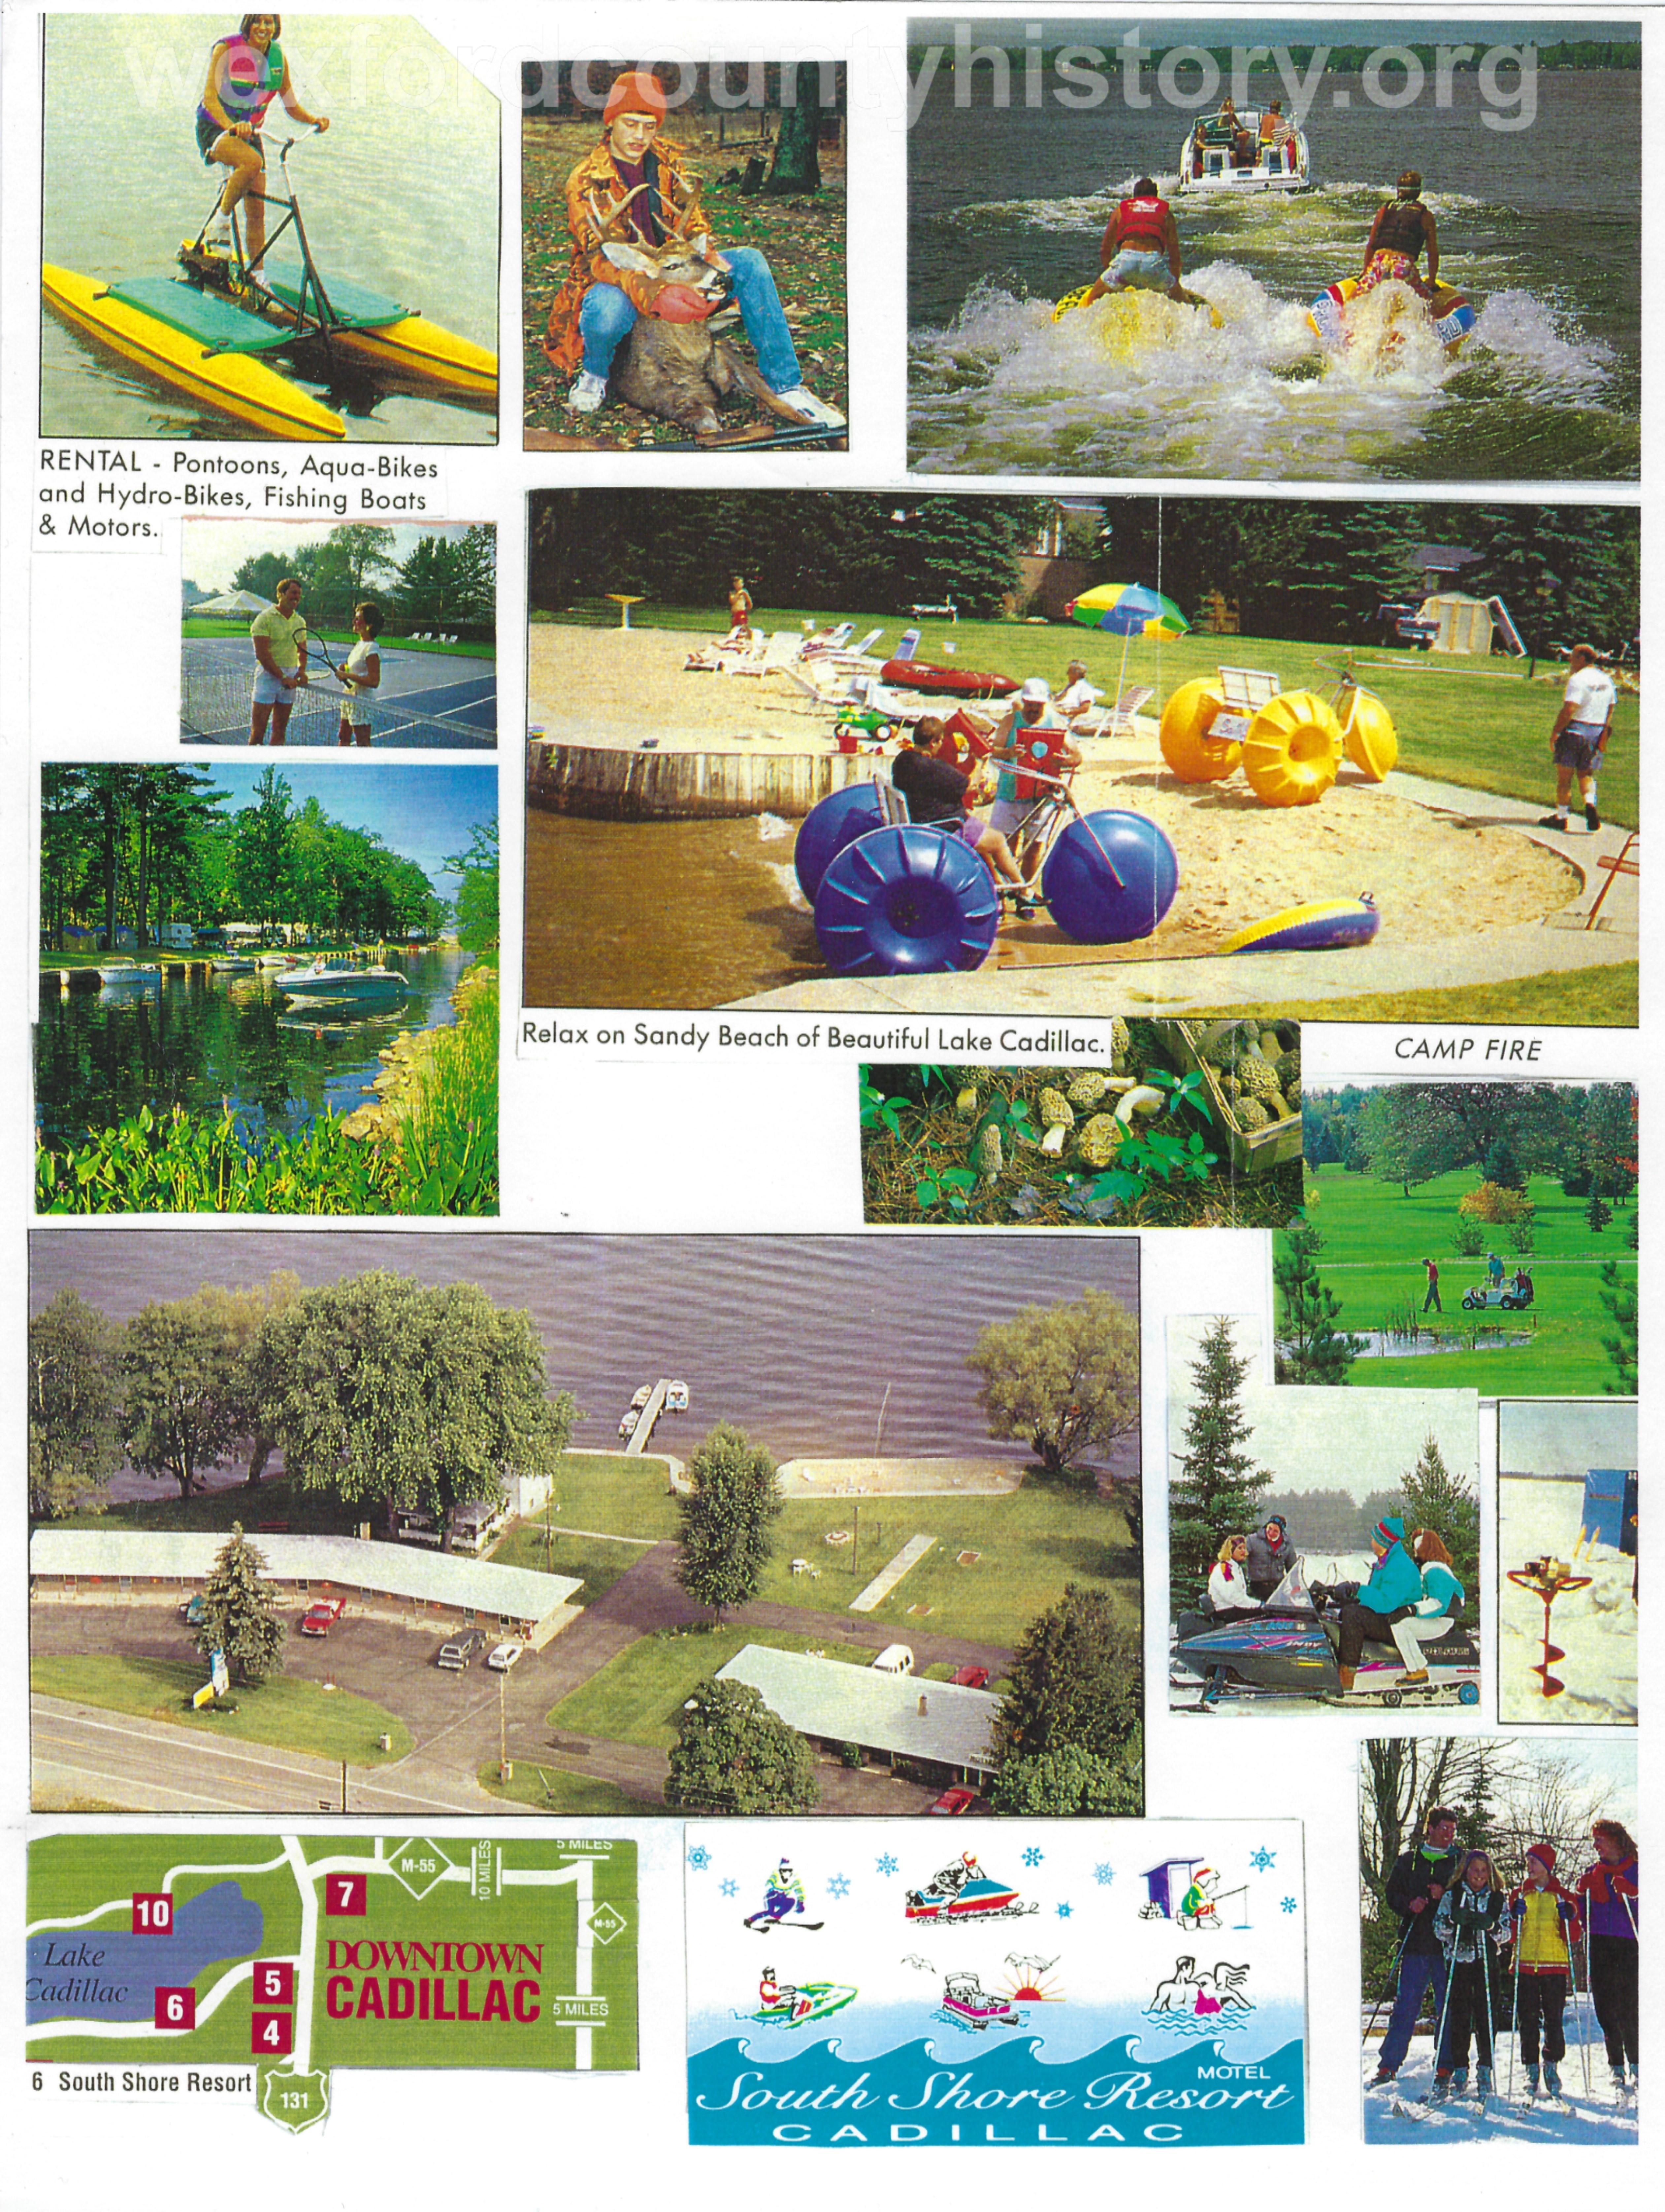 Cadillac-Recreation-Cadillac-Area-Advertisement-2